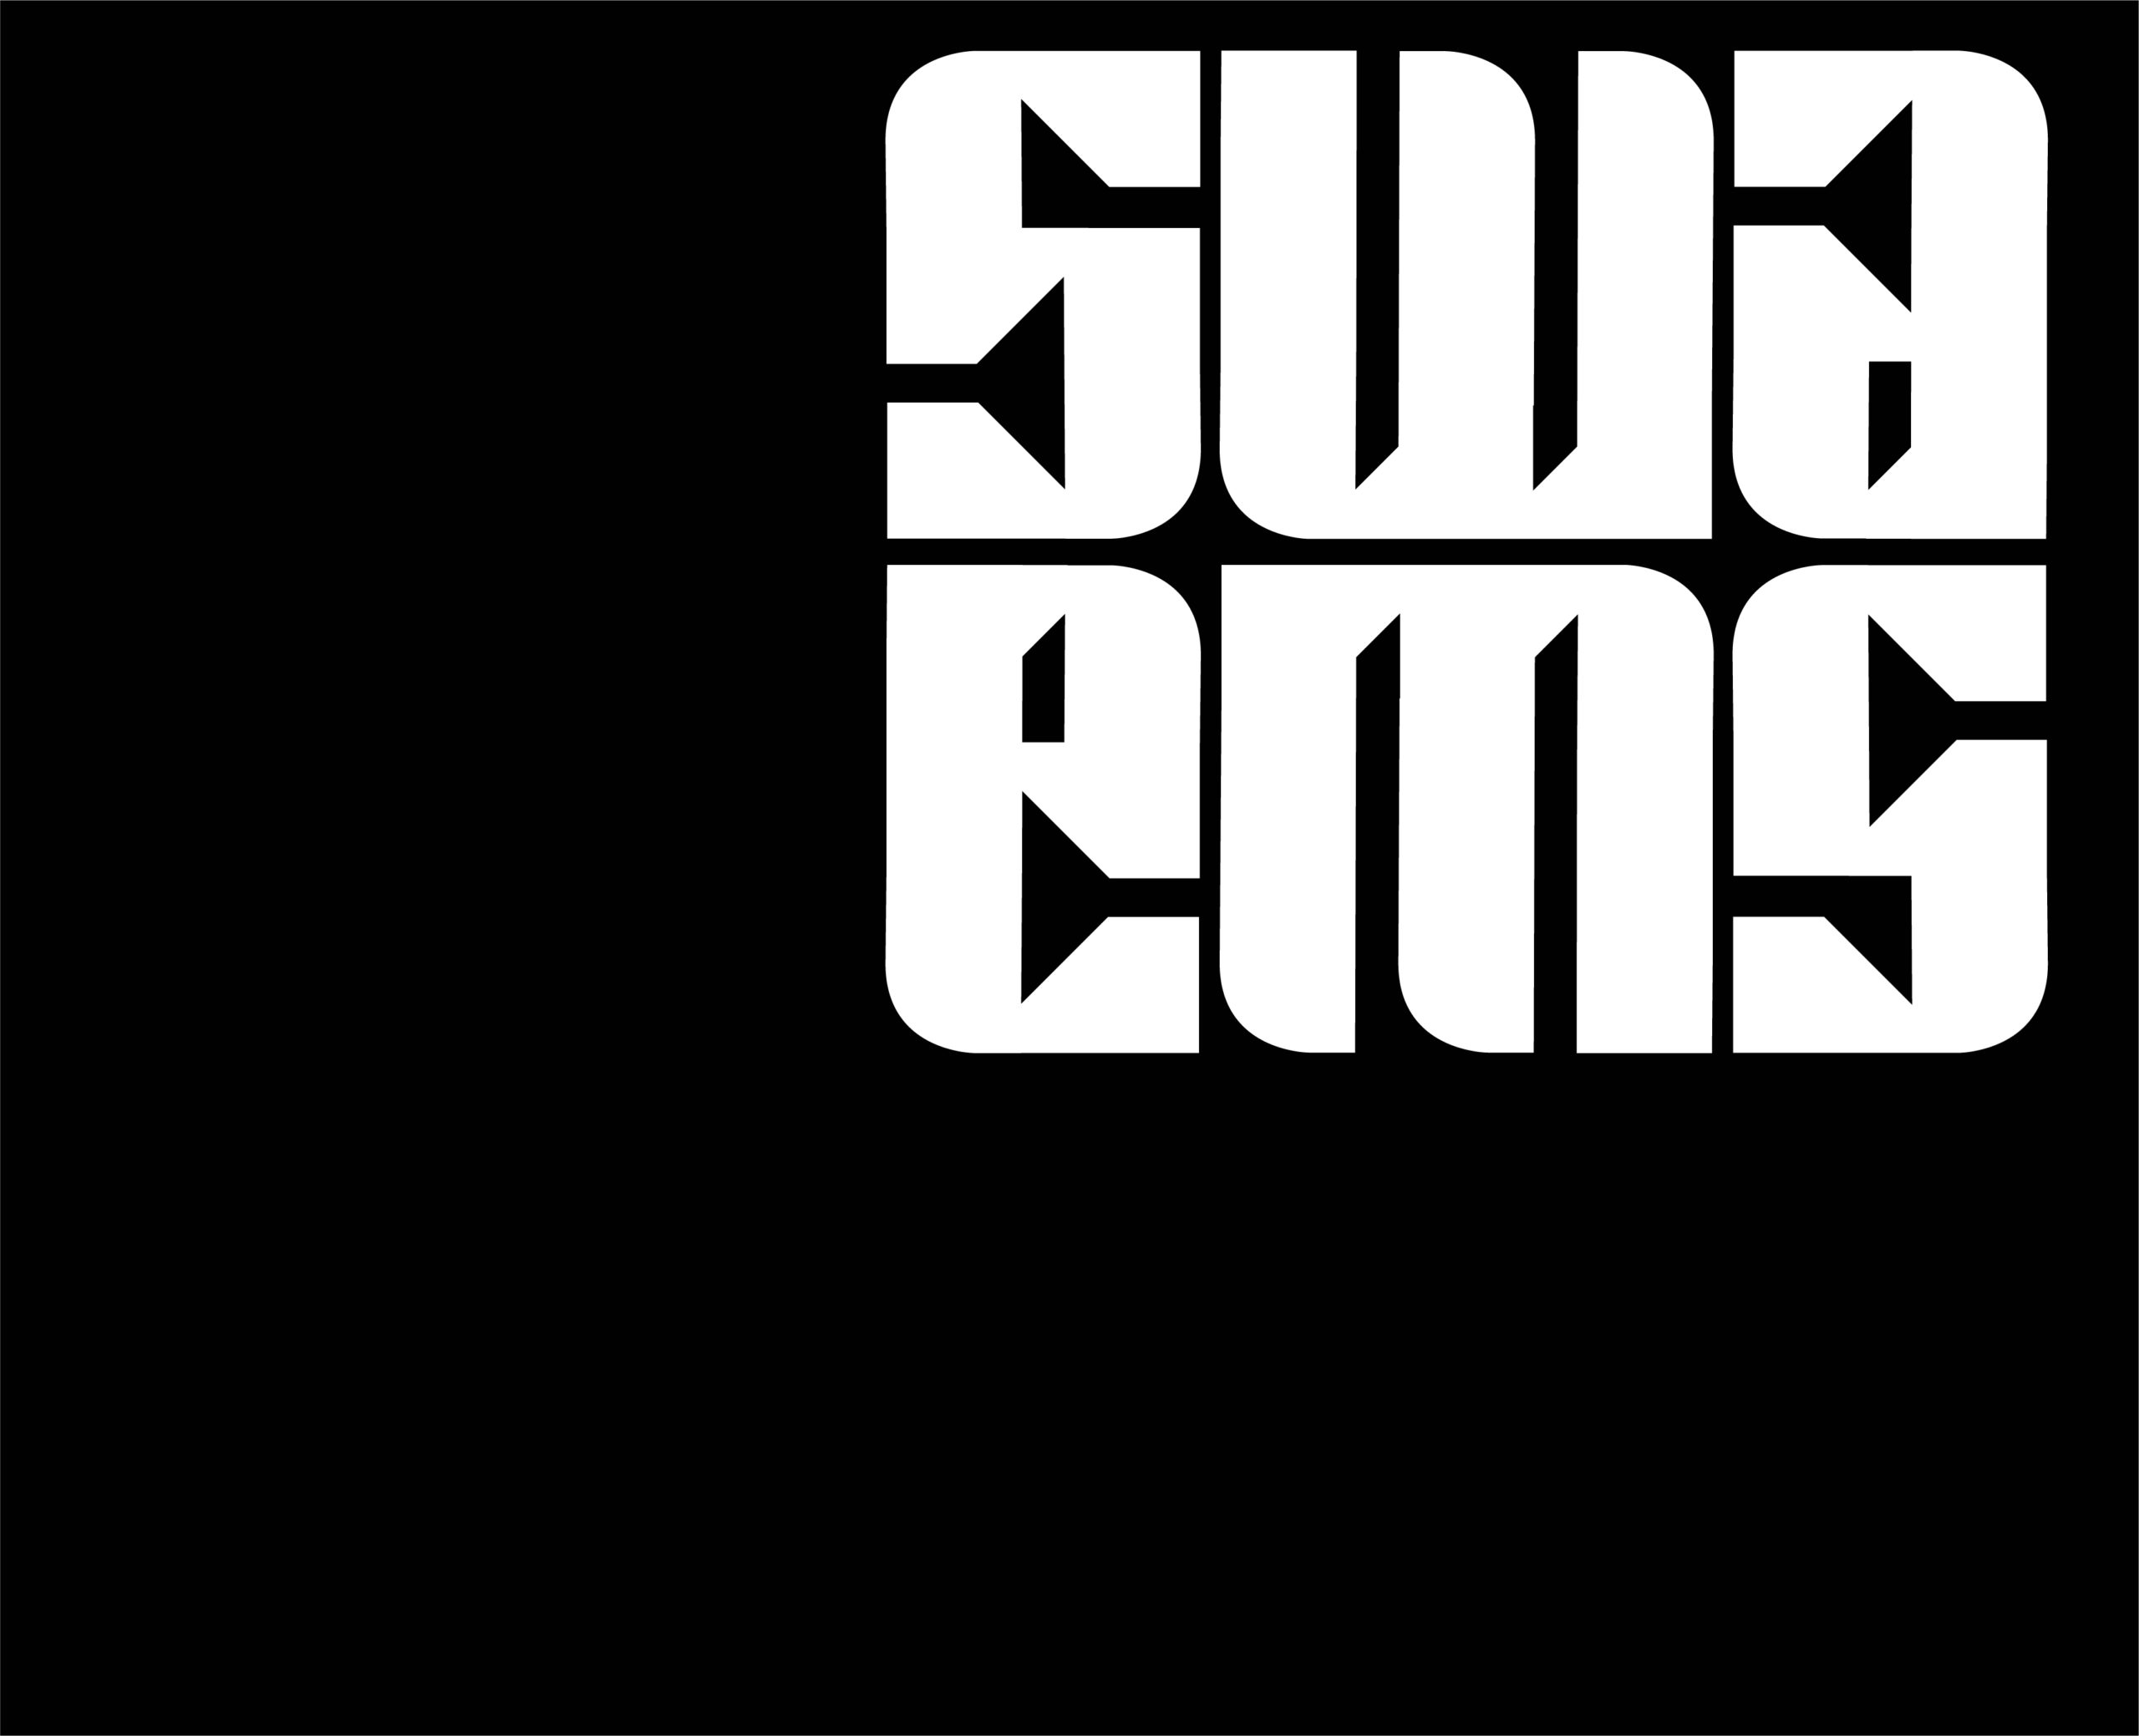 Chisel-Typeface-03